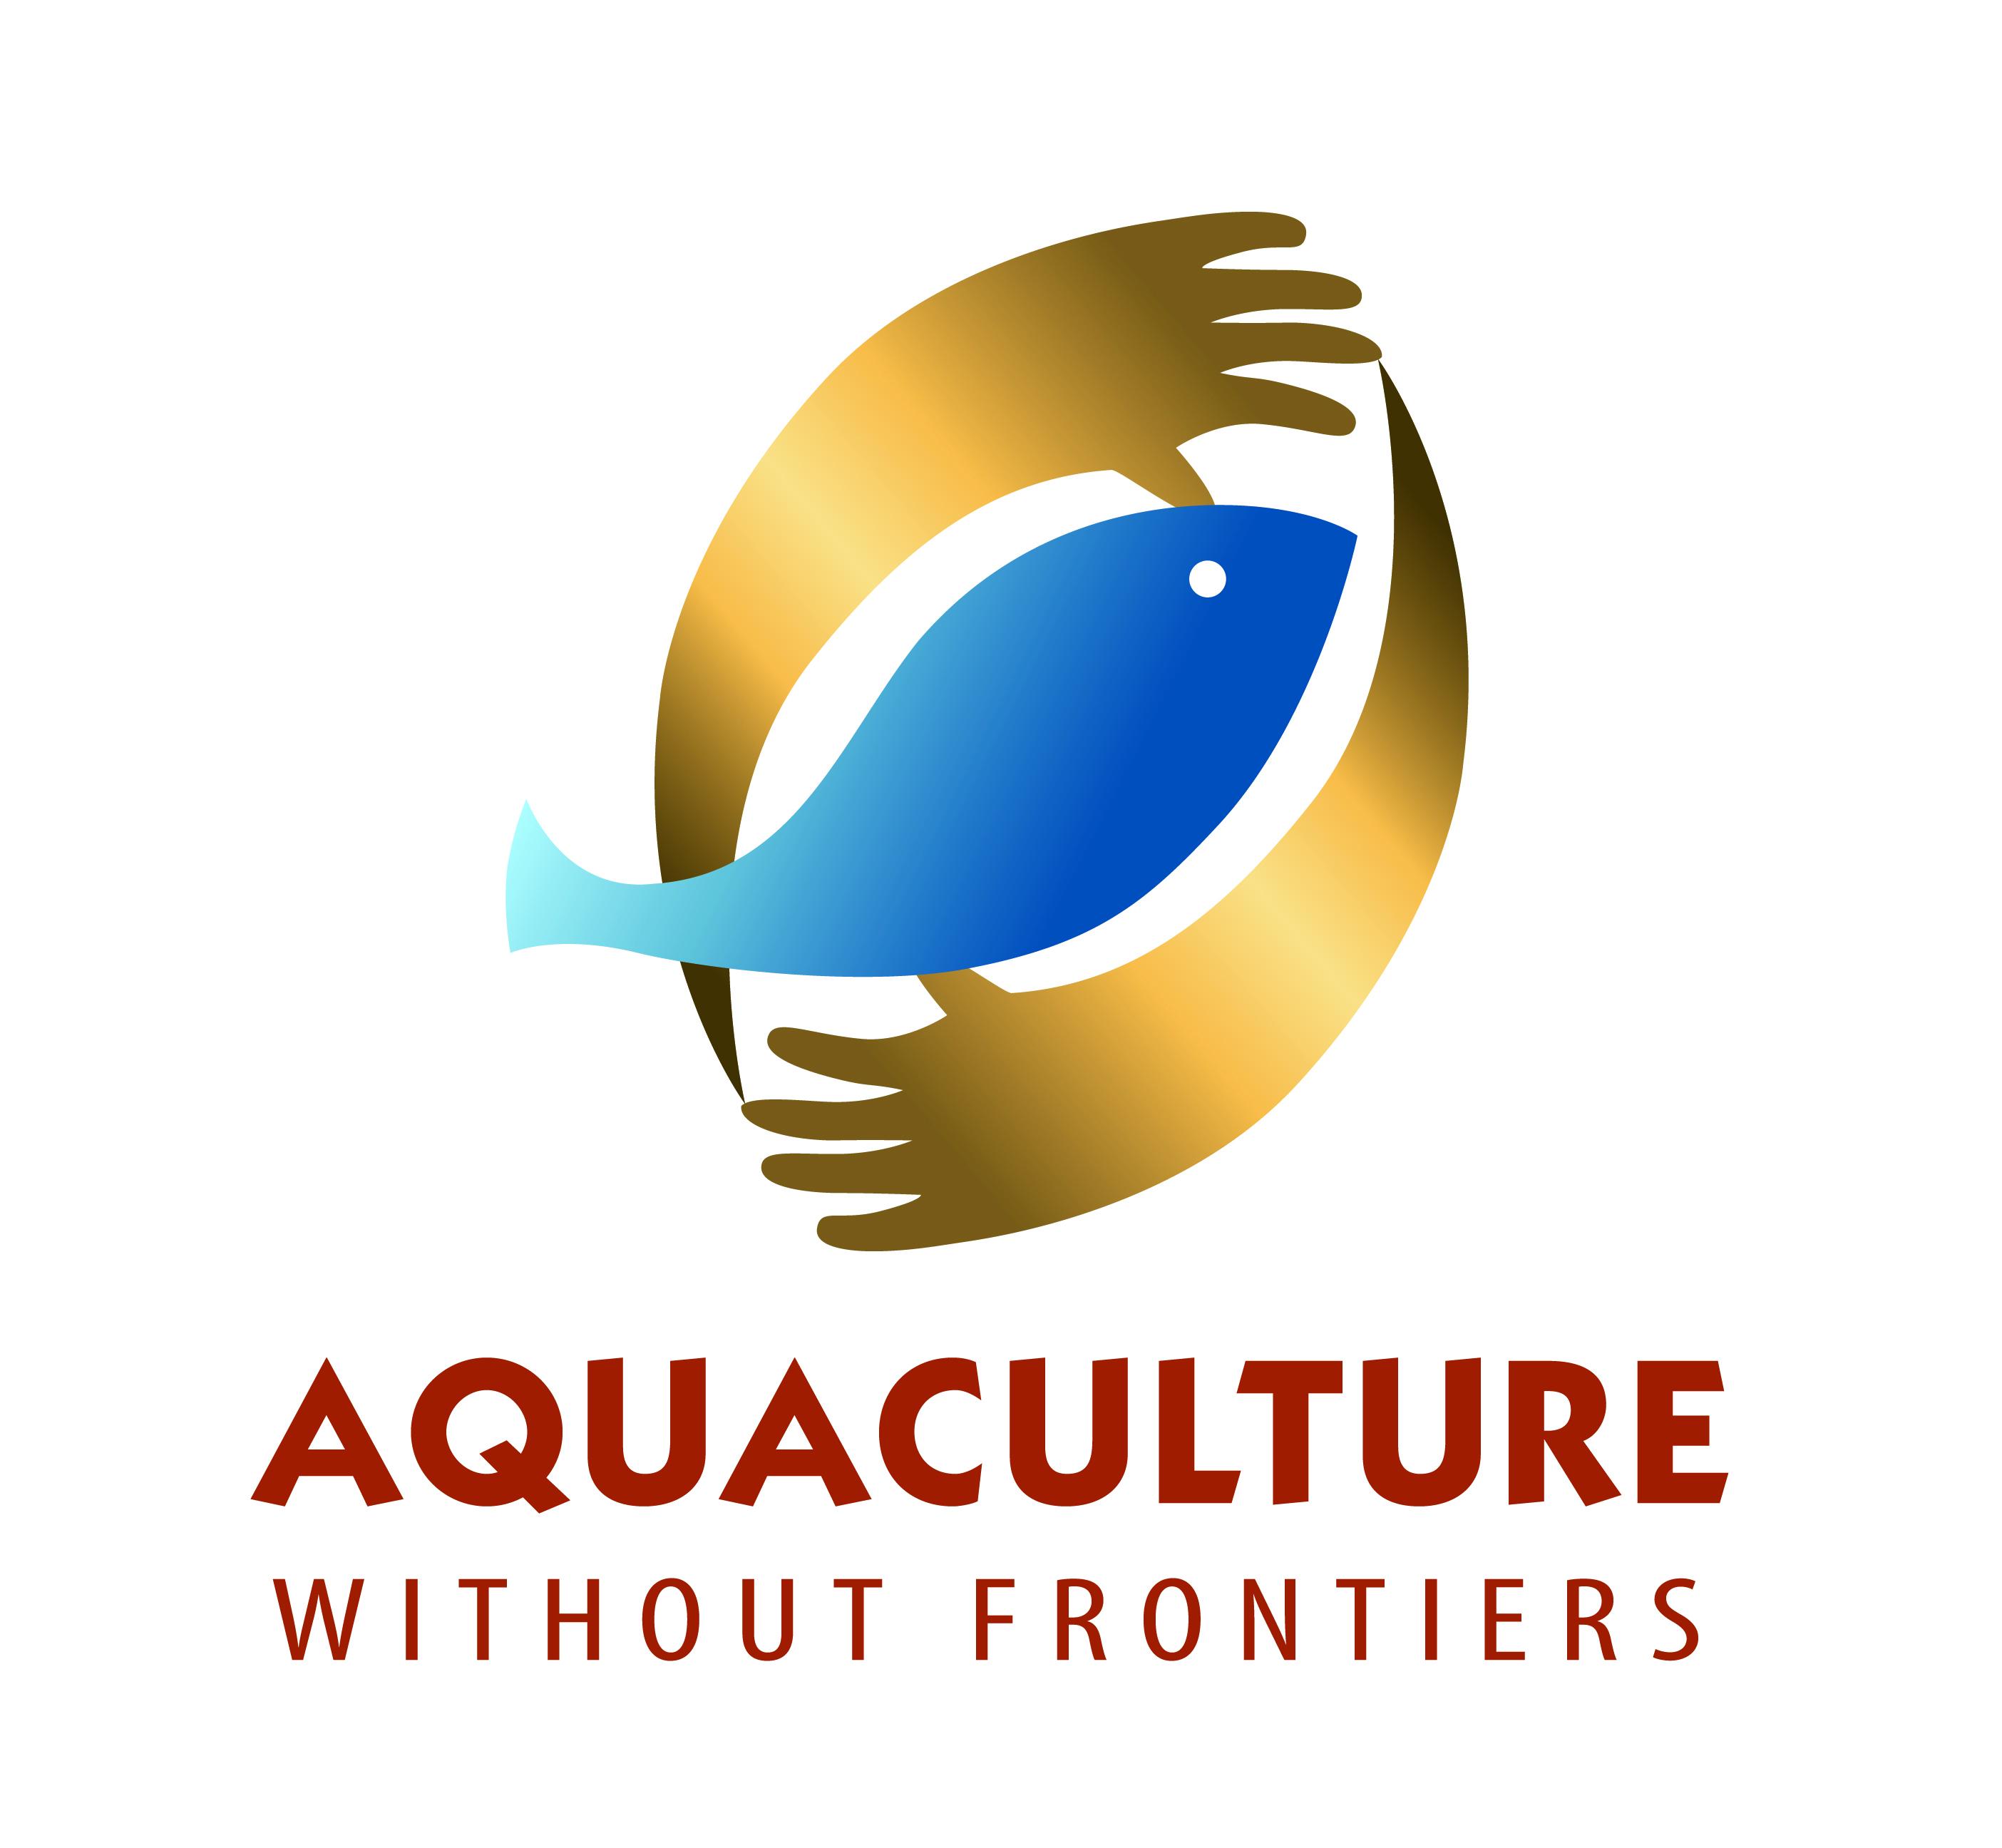 http://issuu.com/international_aquafeed/docs/iaf1502_w1/8